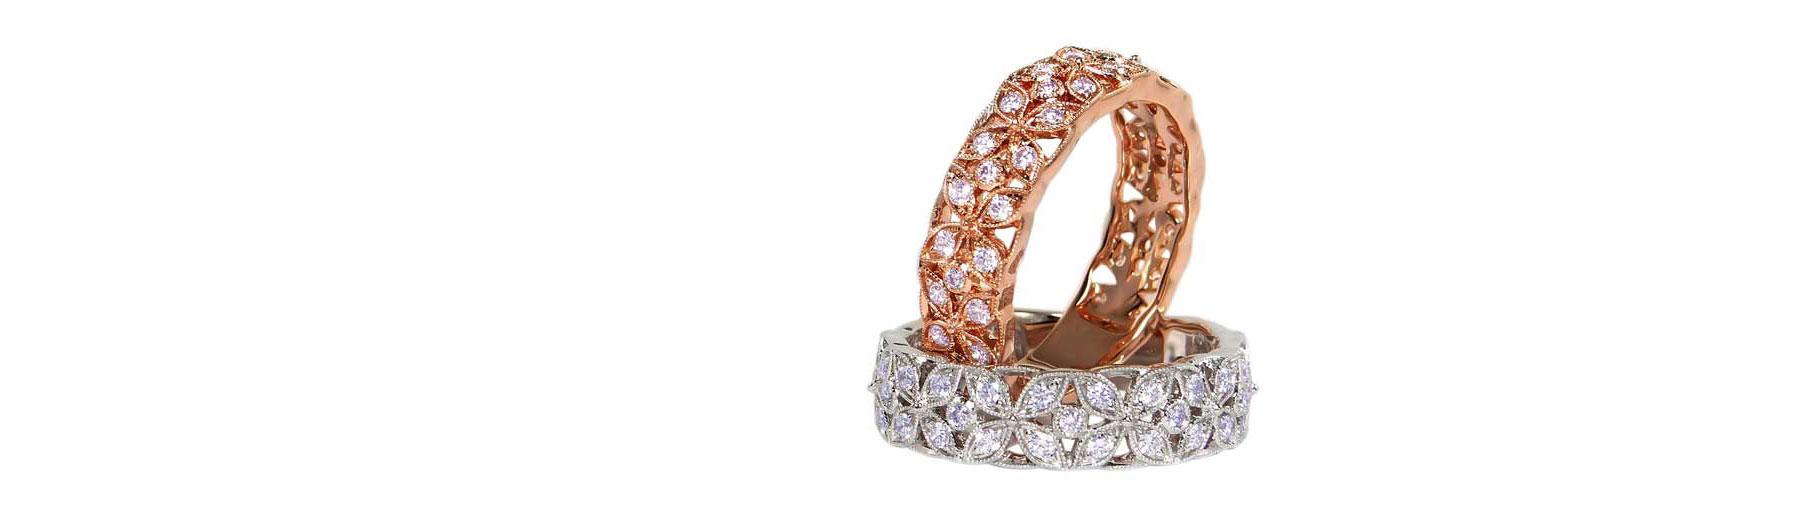 occasions fine jewelry